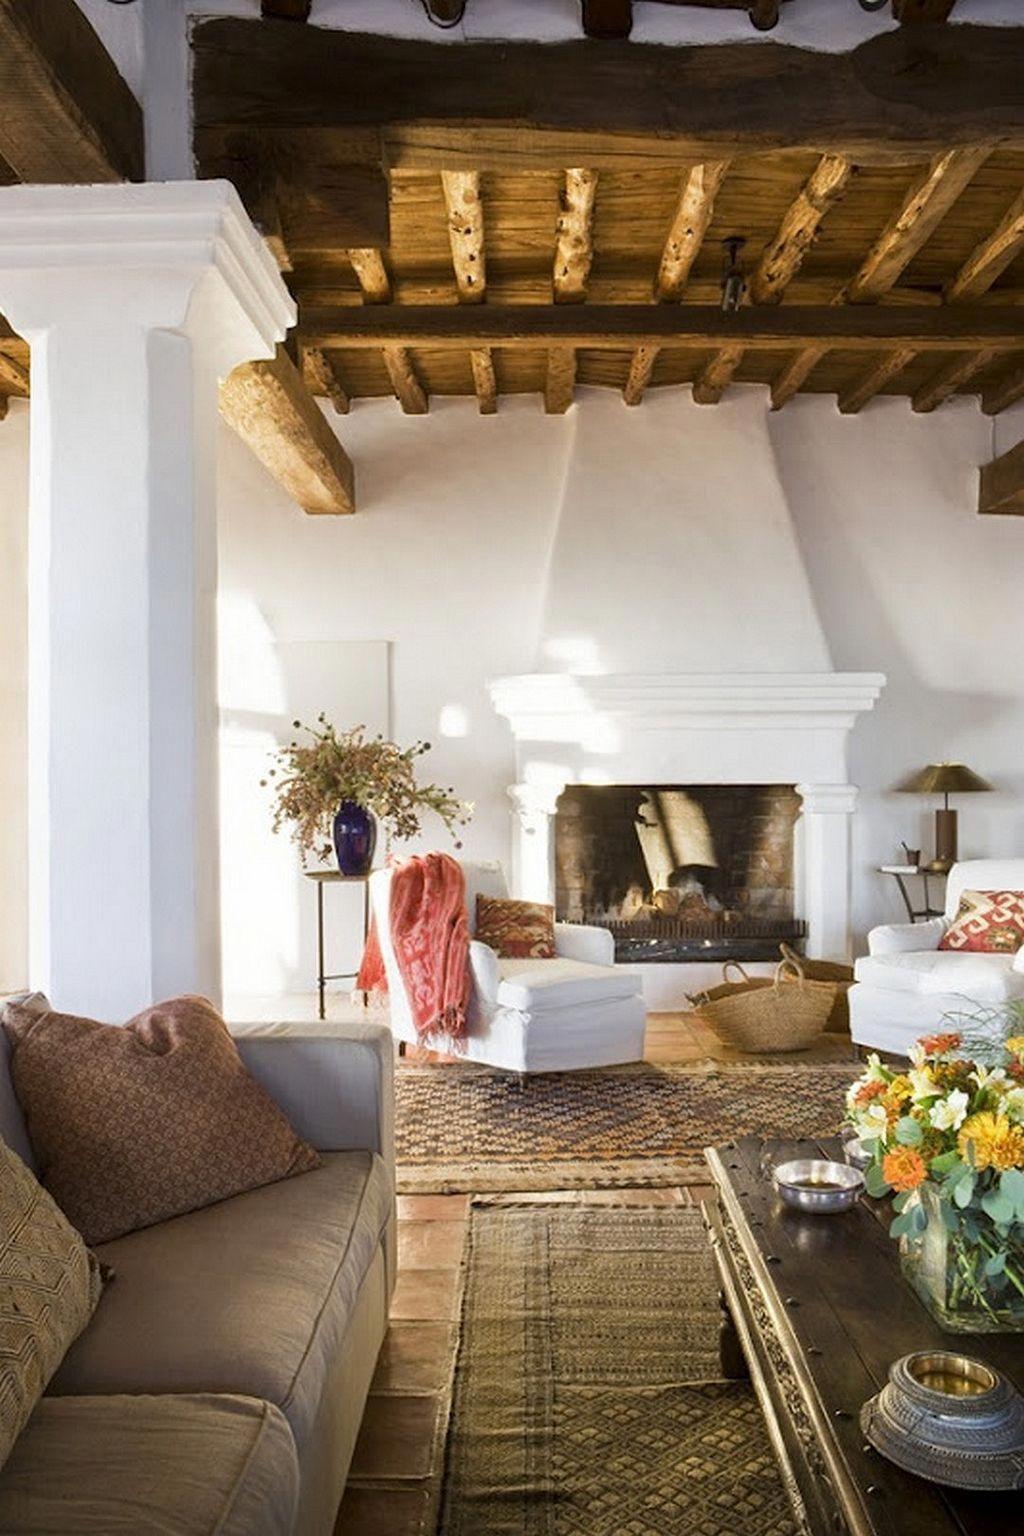 Stunning Cob House Interior Design Ideas 19 Homegardenmagz Spanishstylehomes Cob House Interior Spanish Style Homes Cottage Style Kitchen